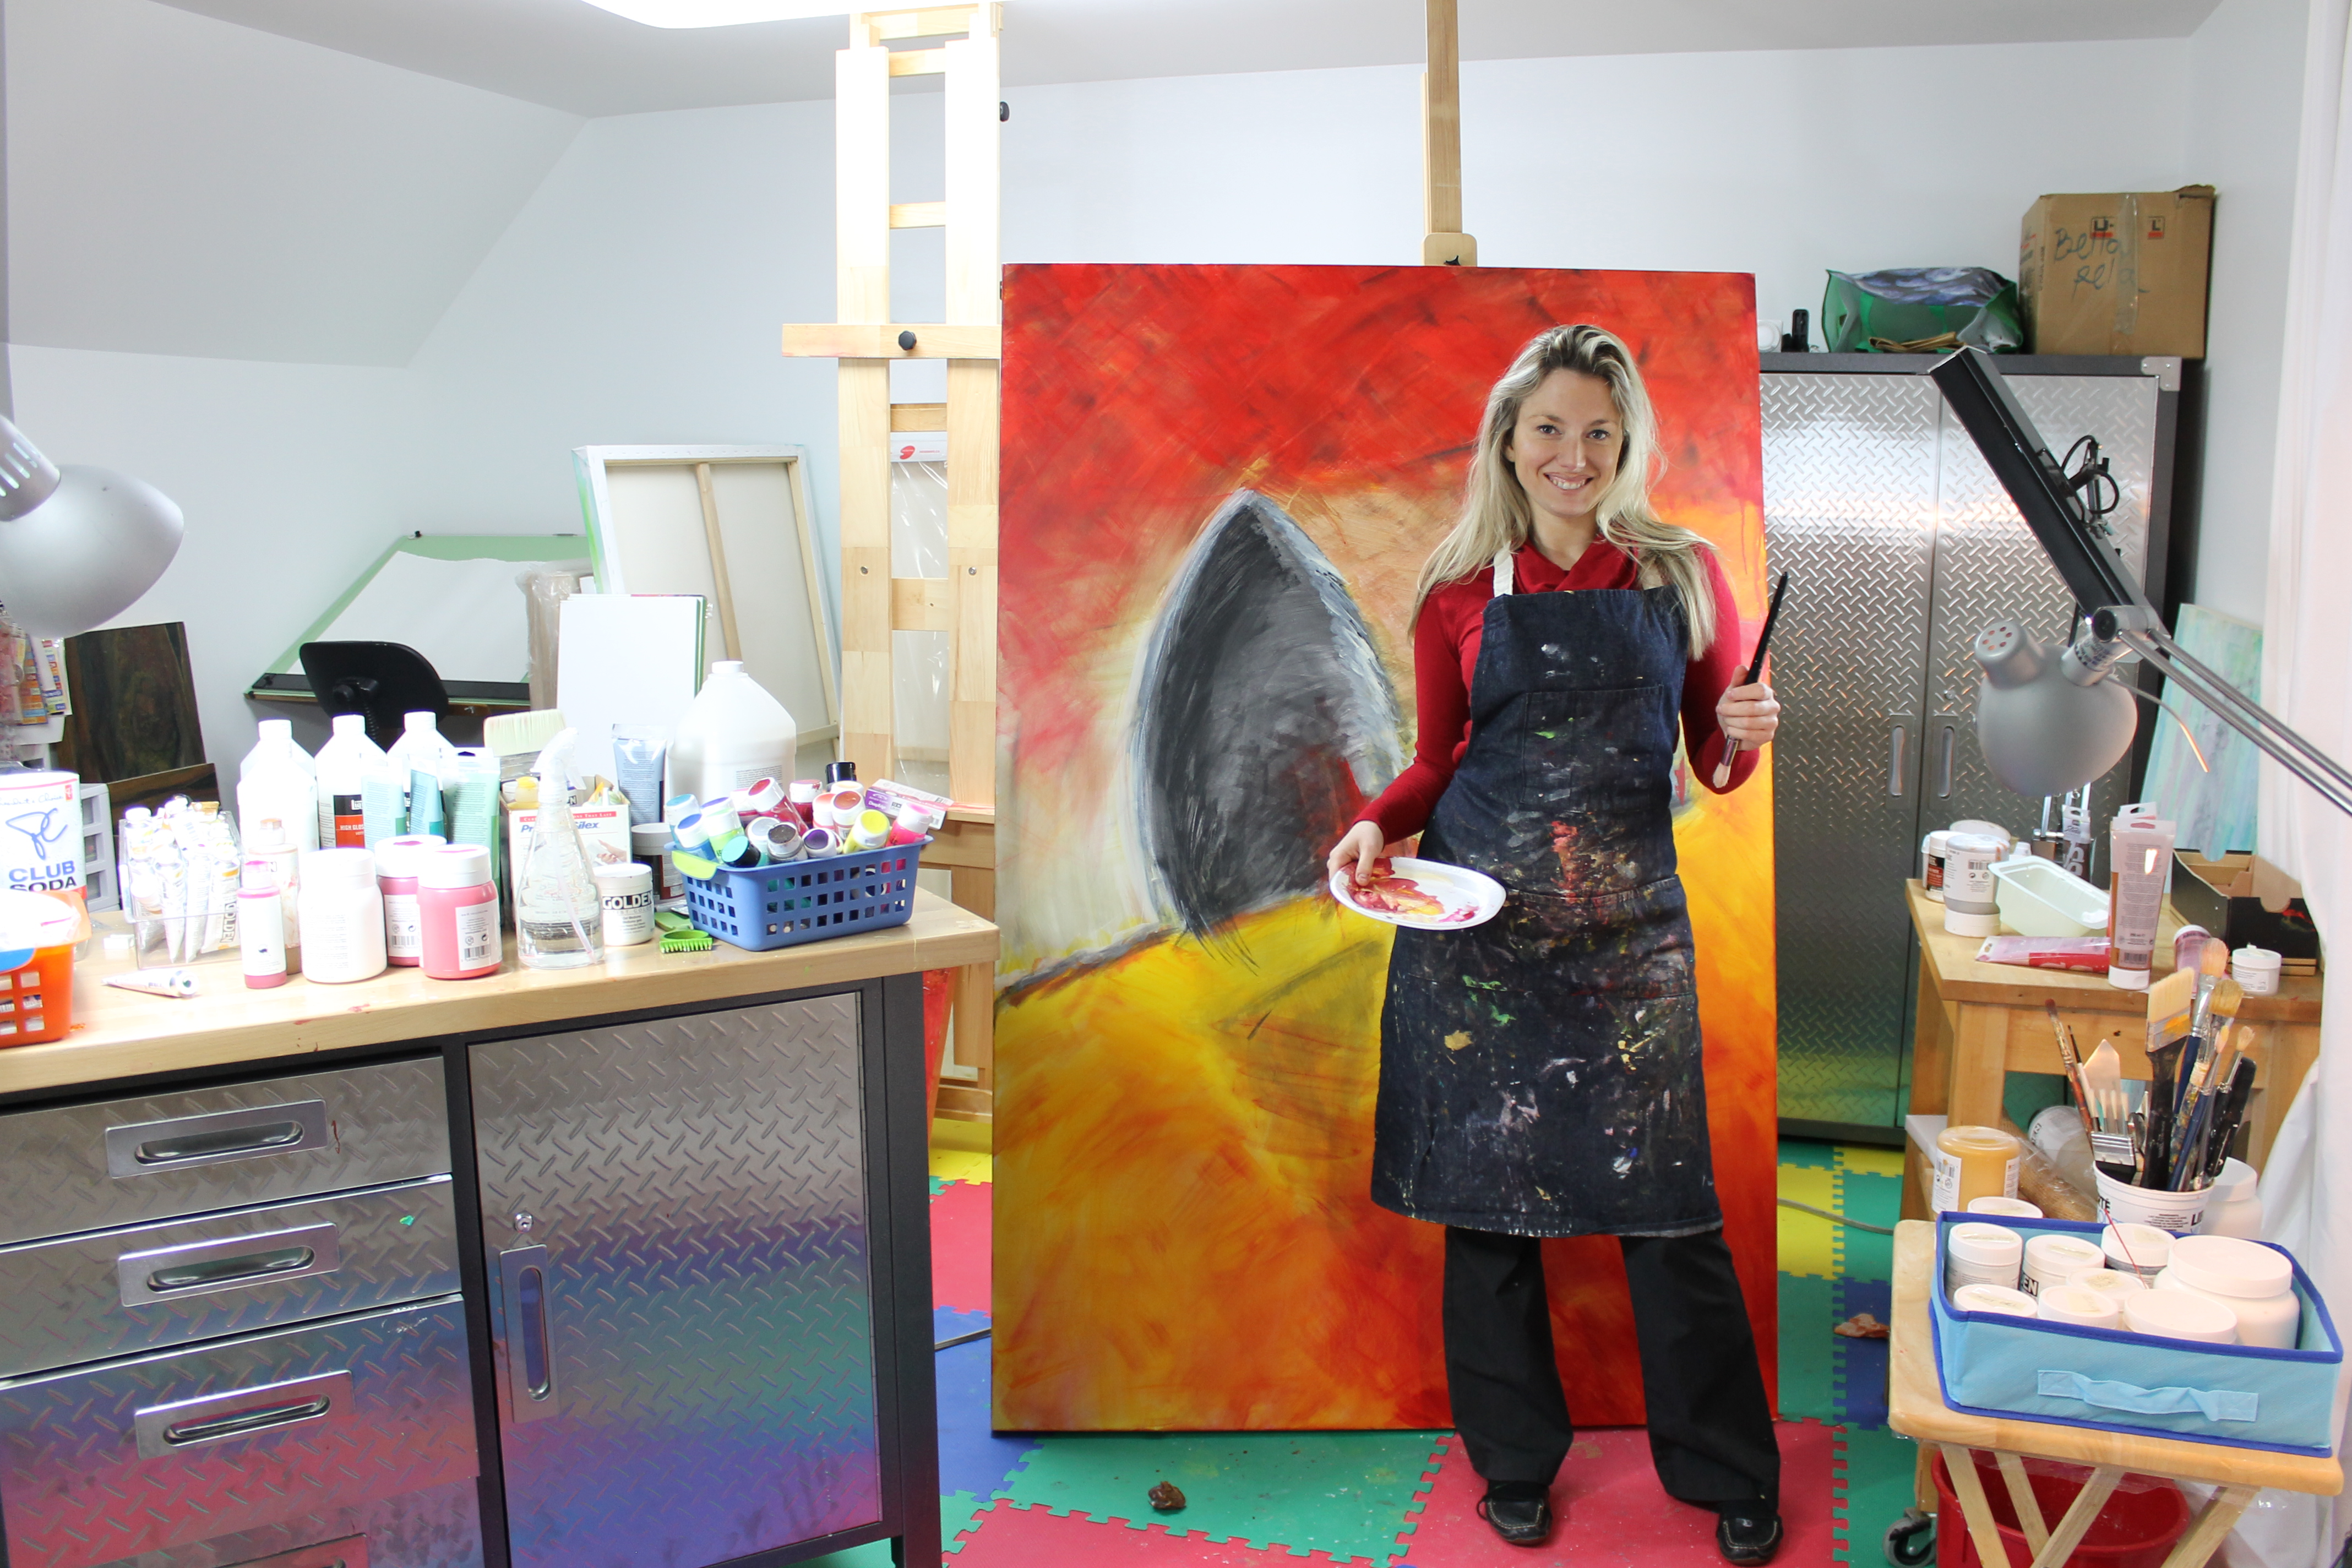 Atelier de l artiste marie ve raymond artiste peintre - Atelier artiste peintre ...